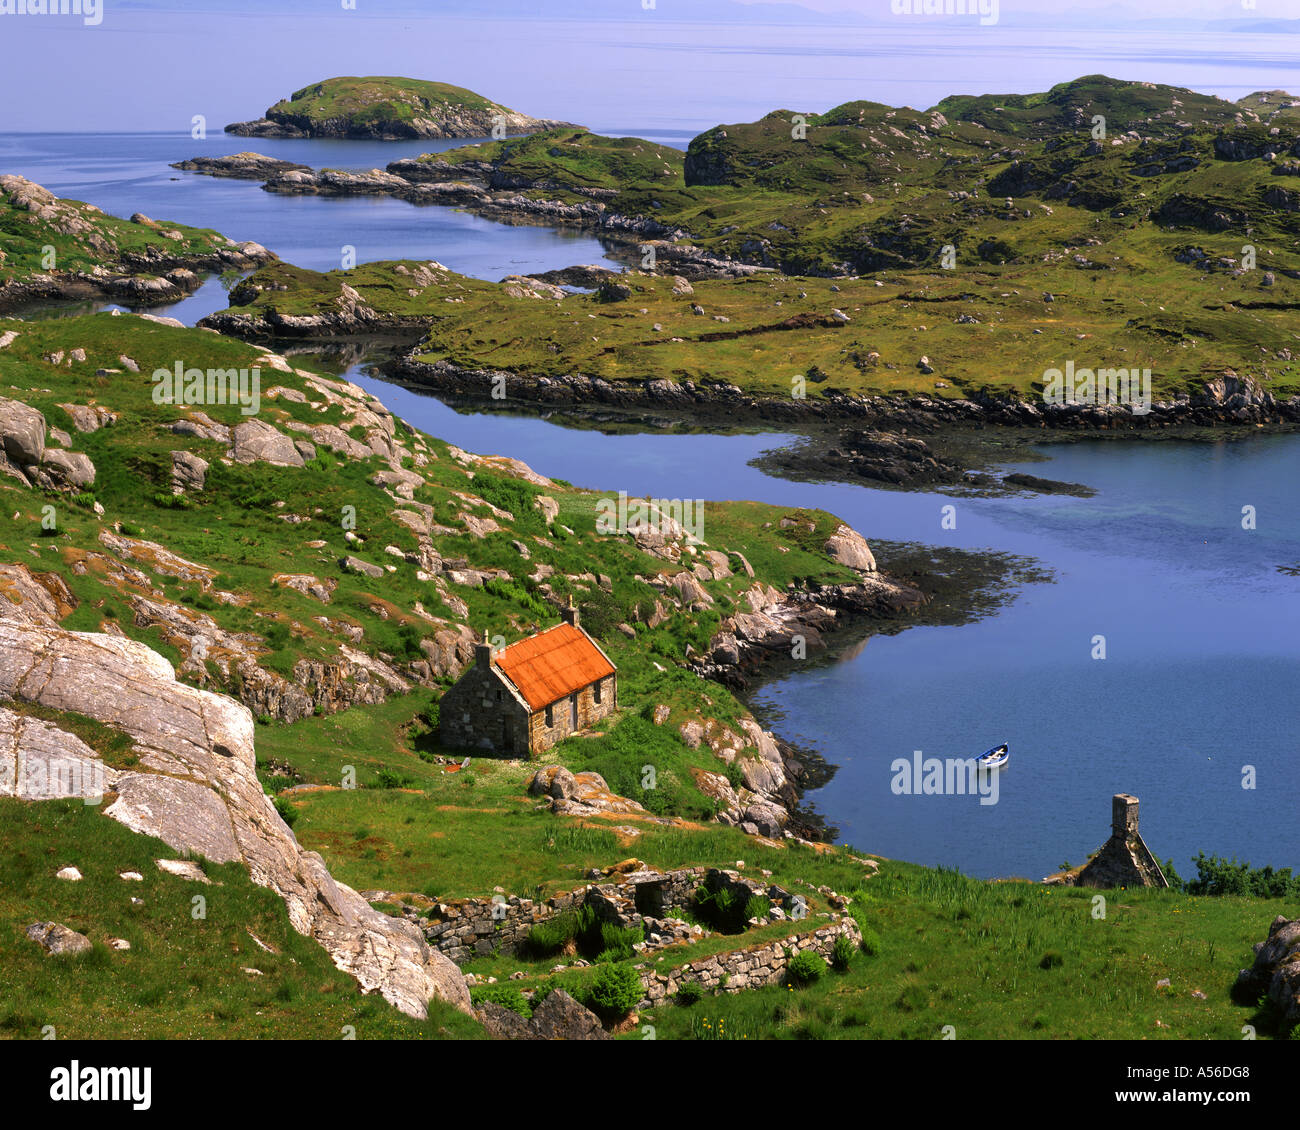 GB - SCOTLAND: Loch Geocrab on Isle of Harris - Stock Image